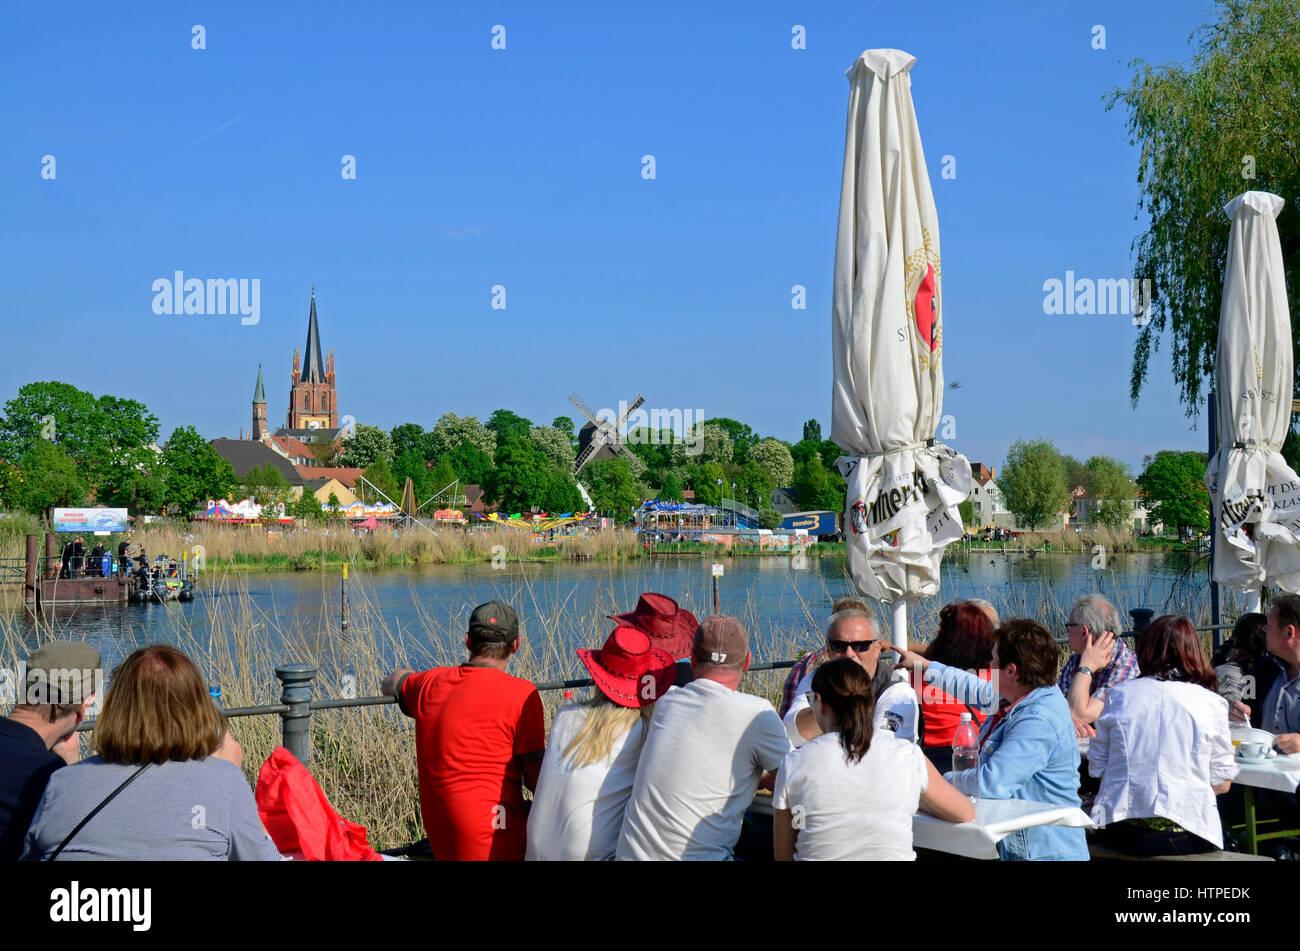 People sitting outside on traditional festival 'Baumblütenfest', Werder (Havel), Brandenburg, Germany, - Stock Image